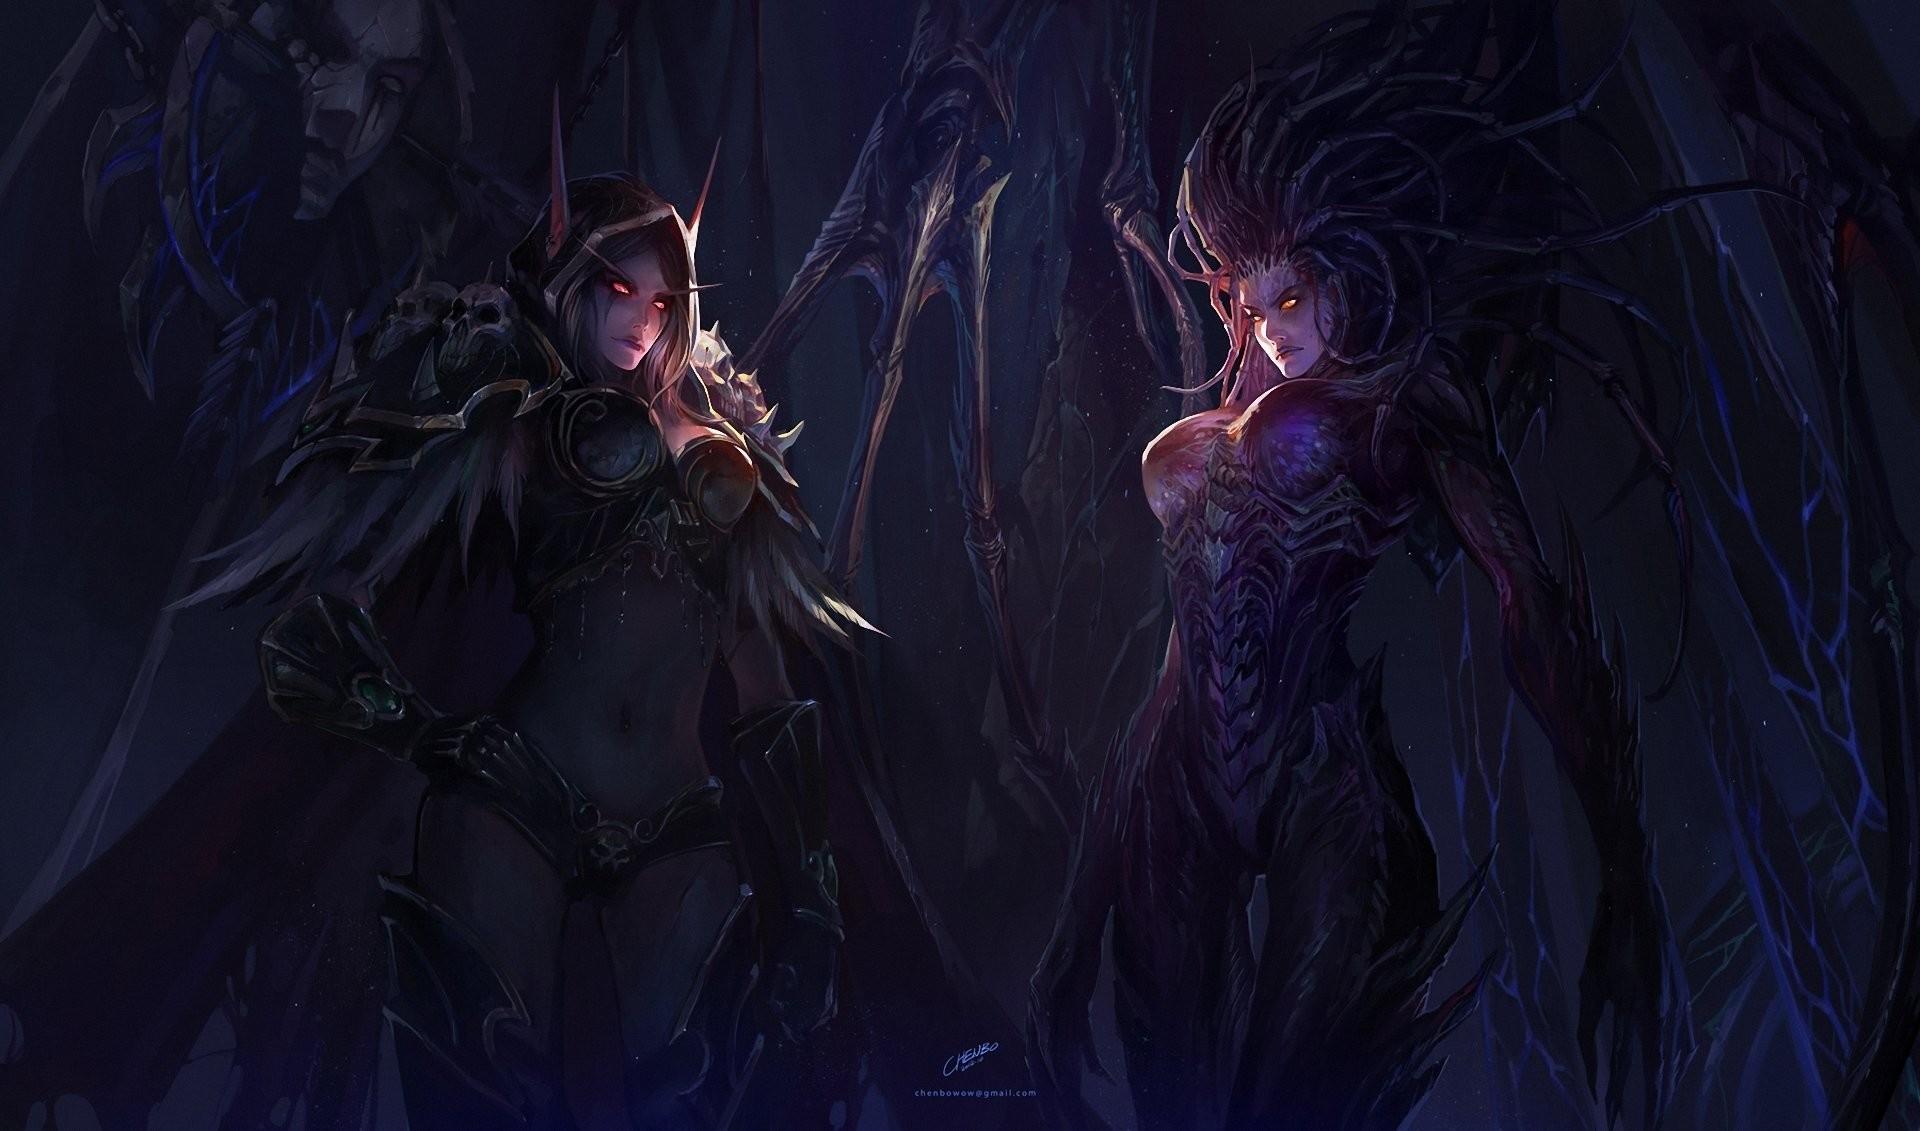 … art chenbo starcraft world of warcraft sylvanas windrunner sarah  kerrigan girls elf wings hood …